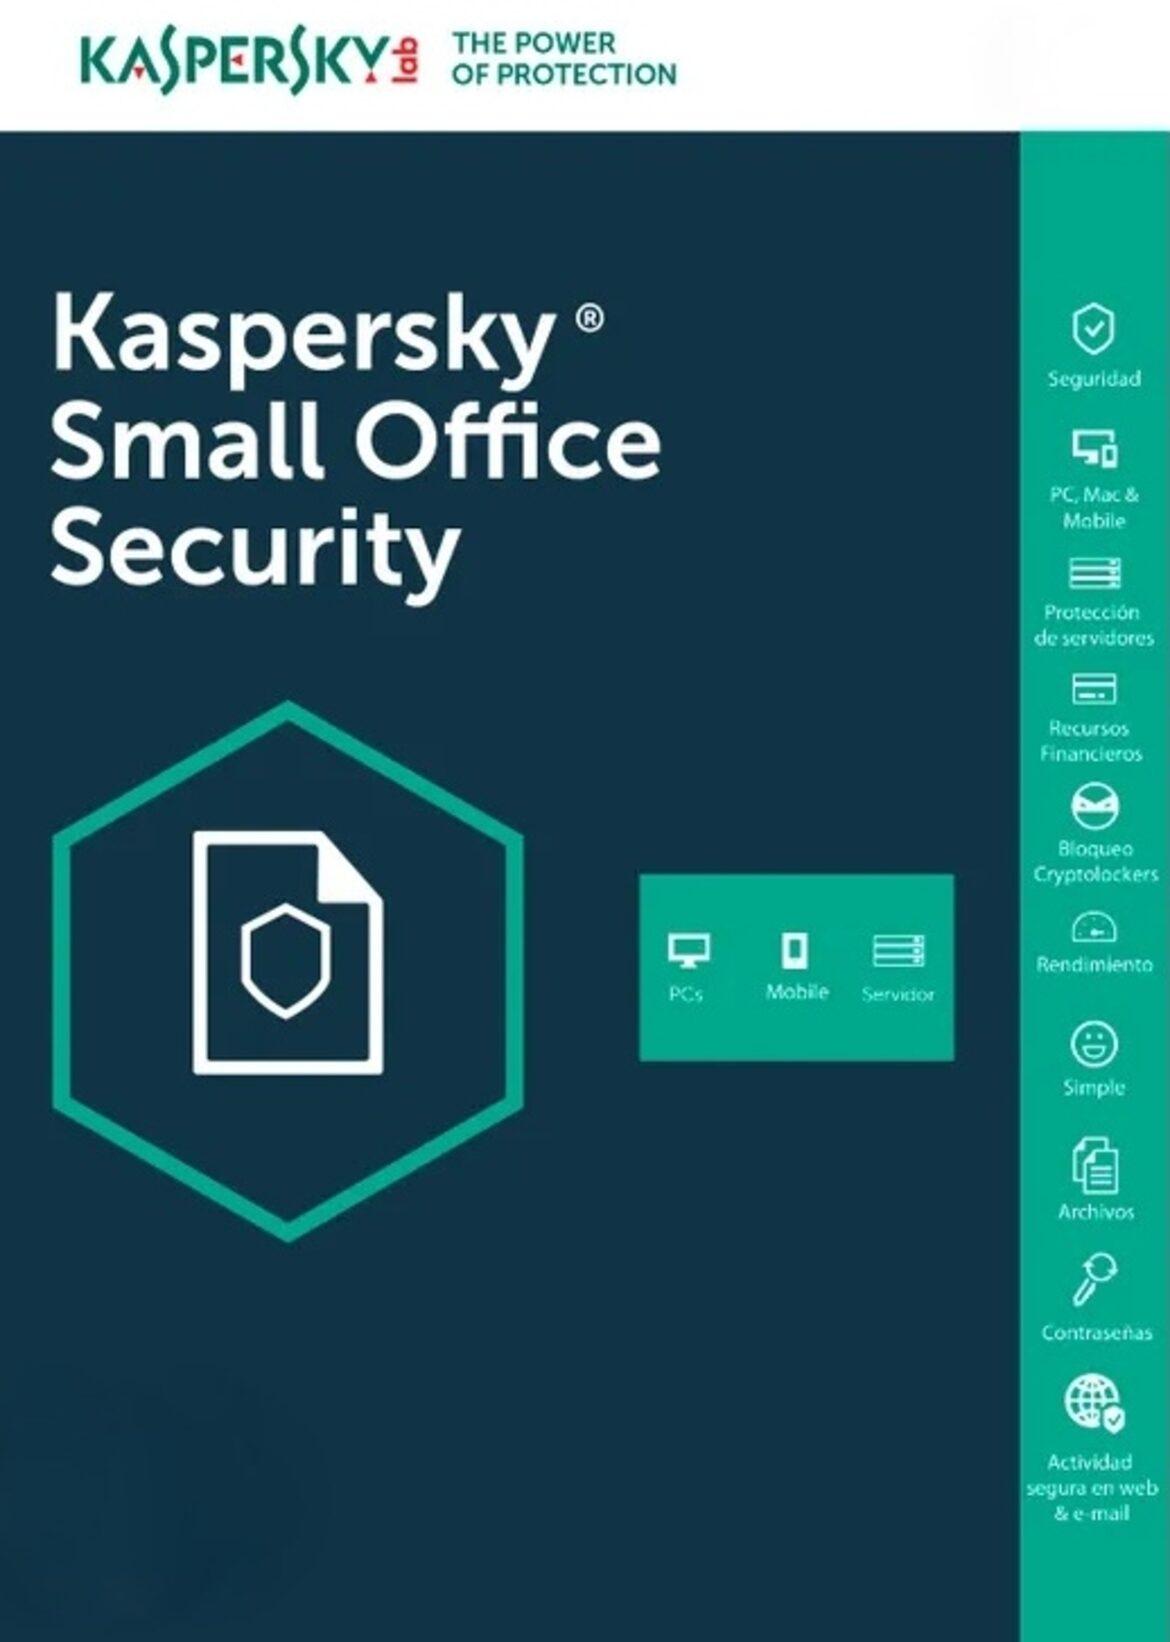 Buy Kaspersky Small Office Security 20 Devices 12 Months Kaspersky Key Global Eneba